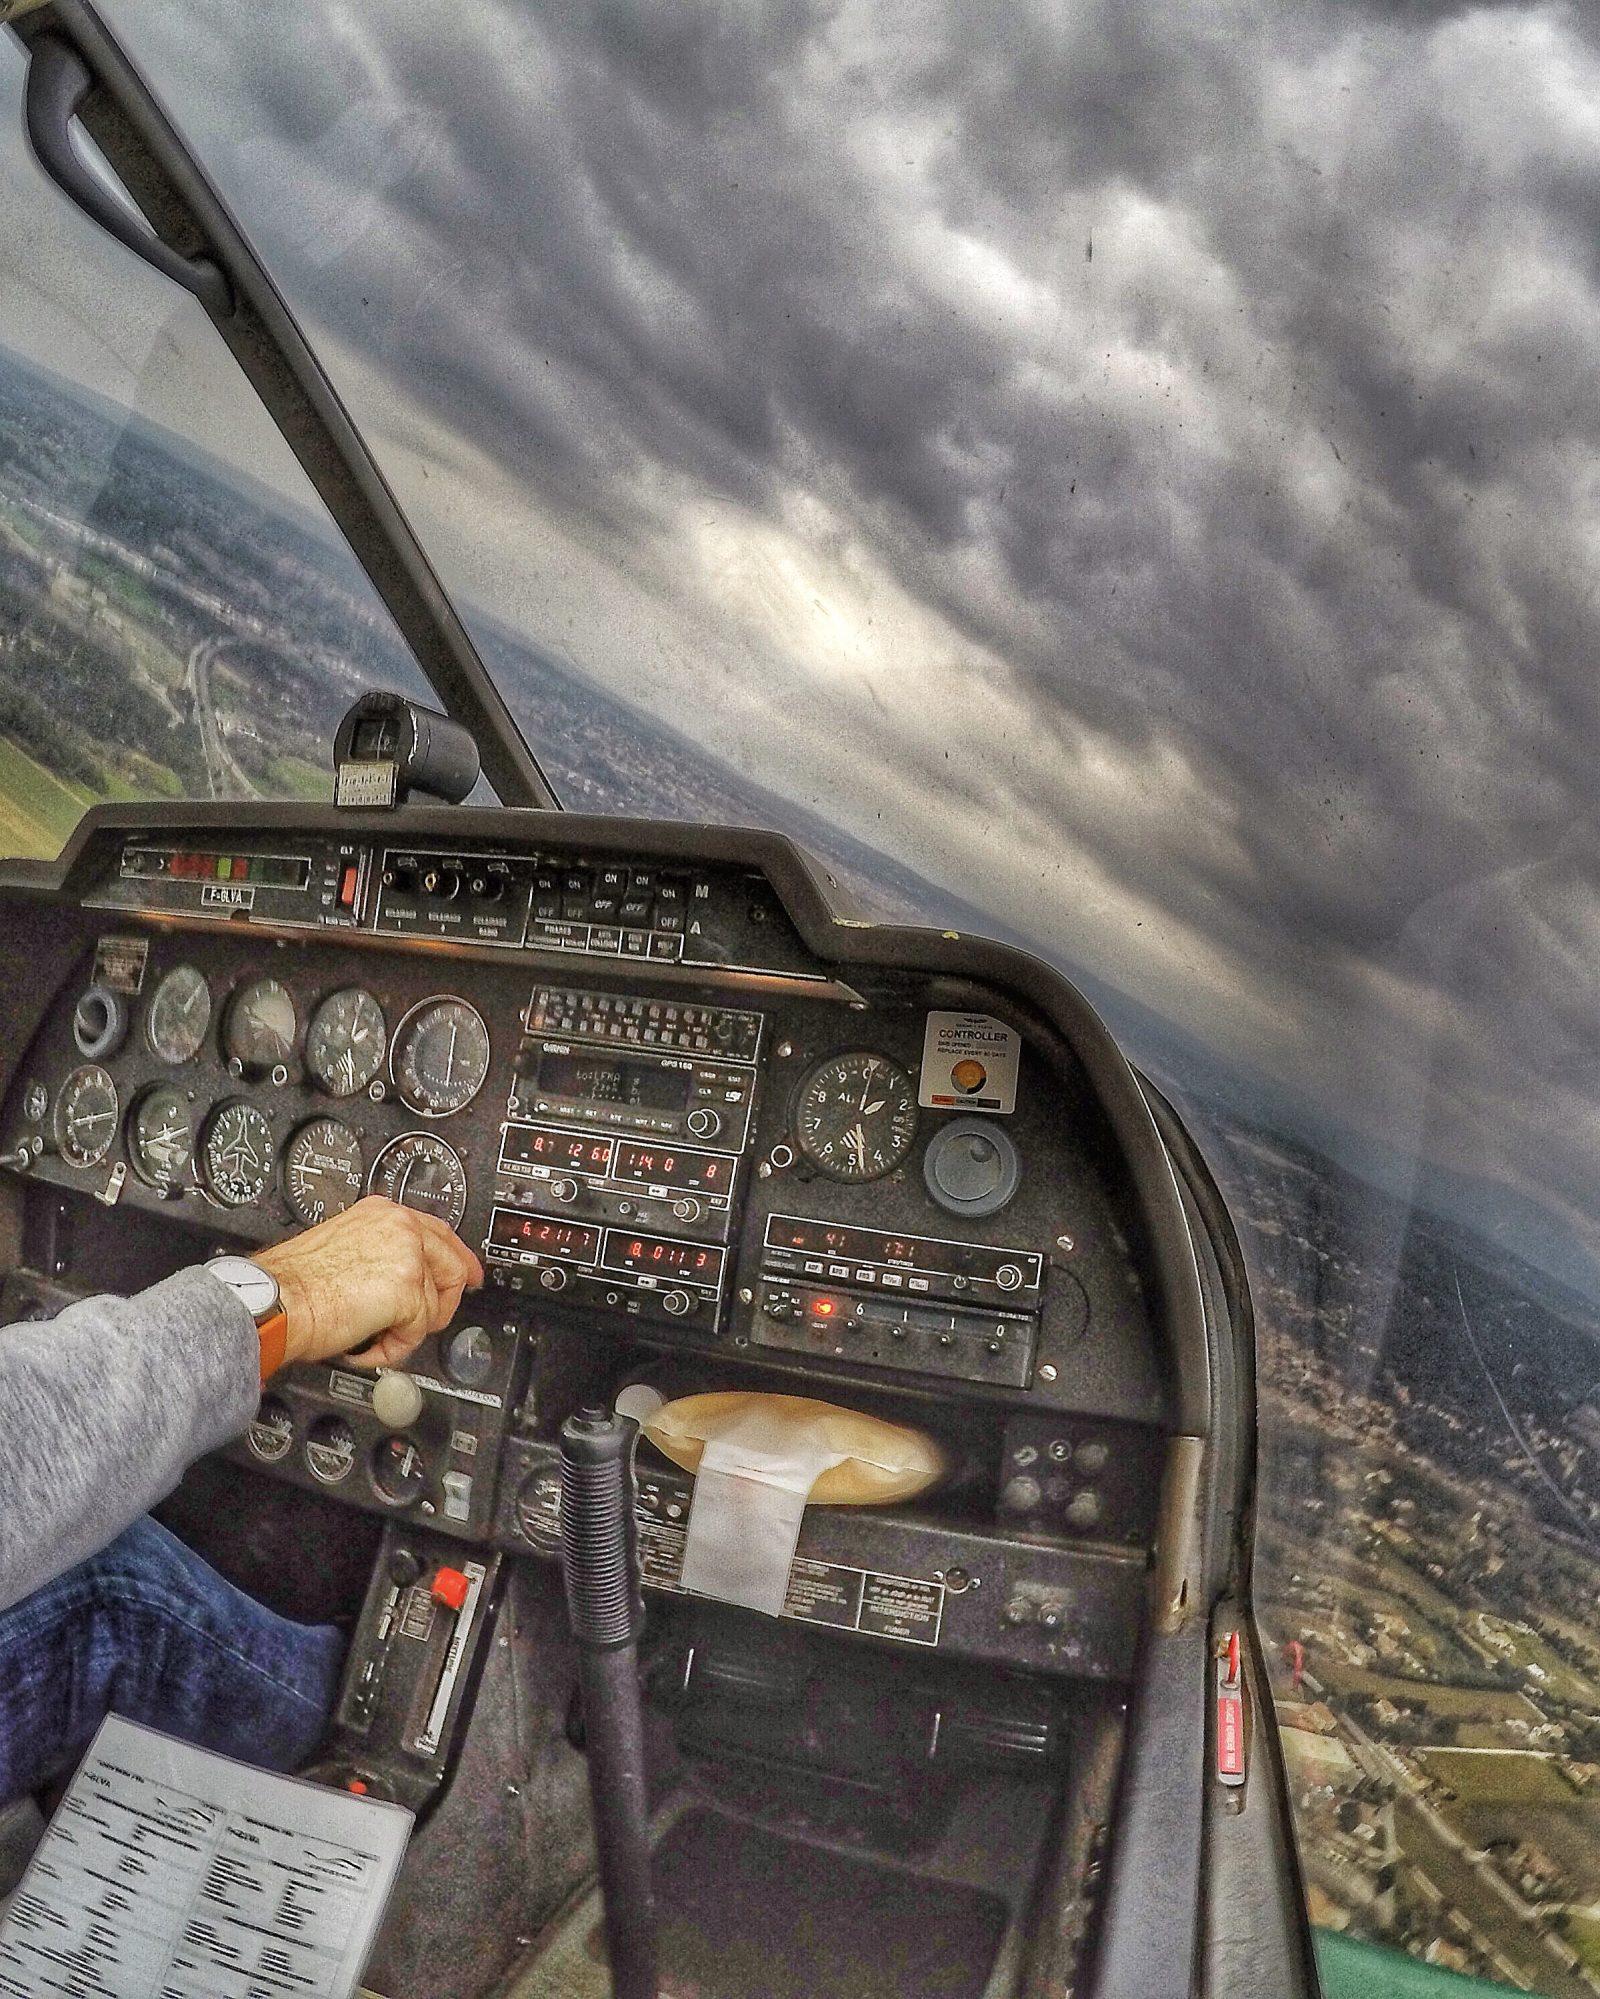 Robin DR400 cloudy flight